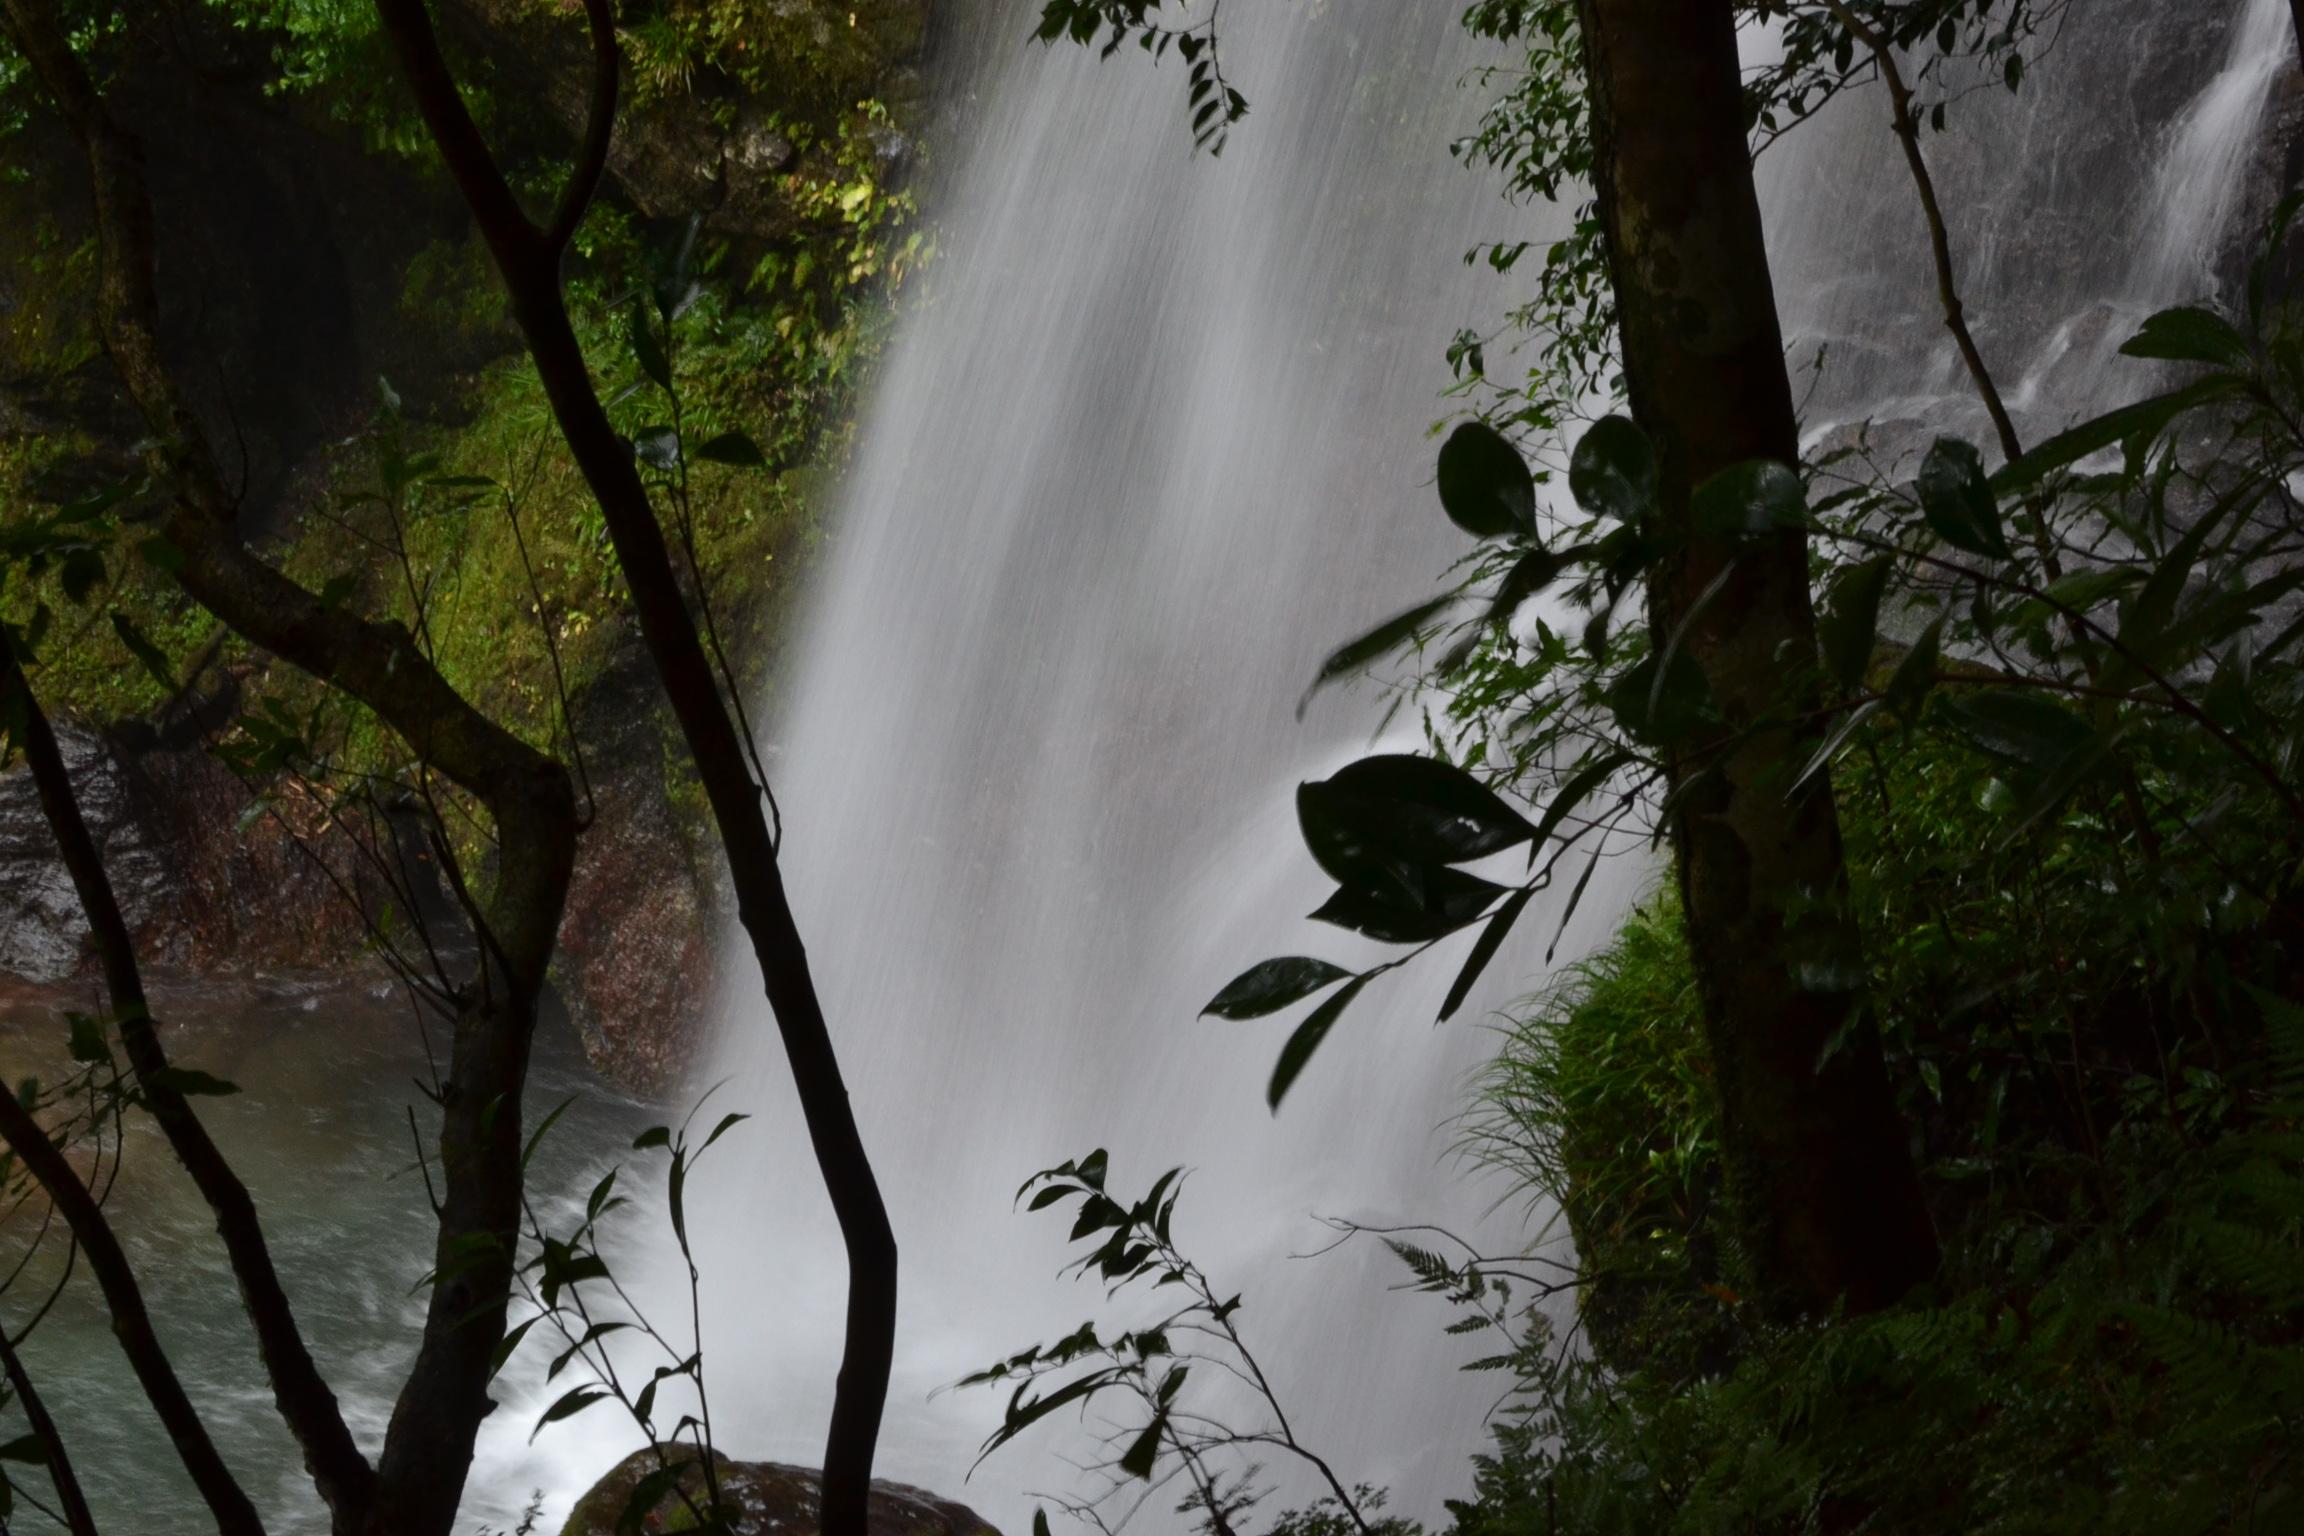 高知市 鏡 平家の滝